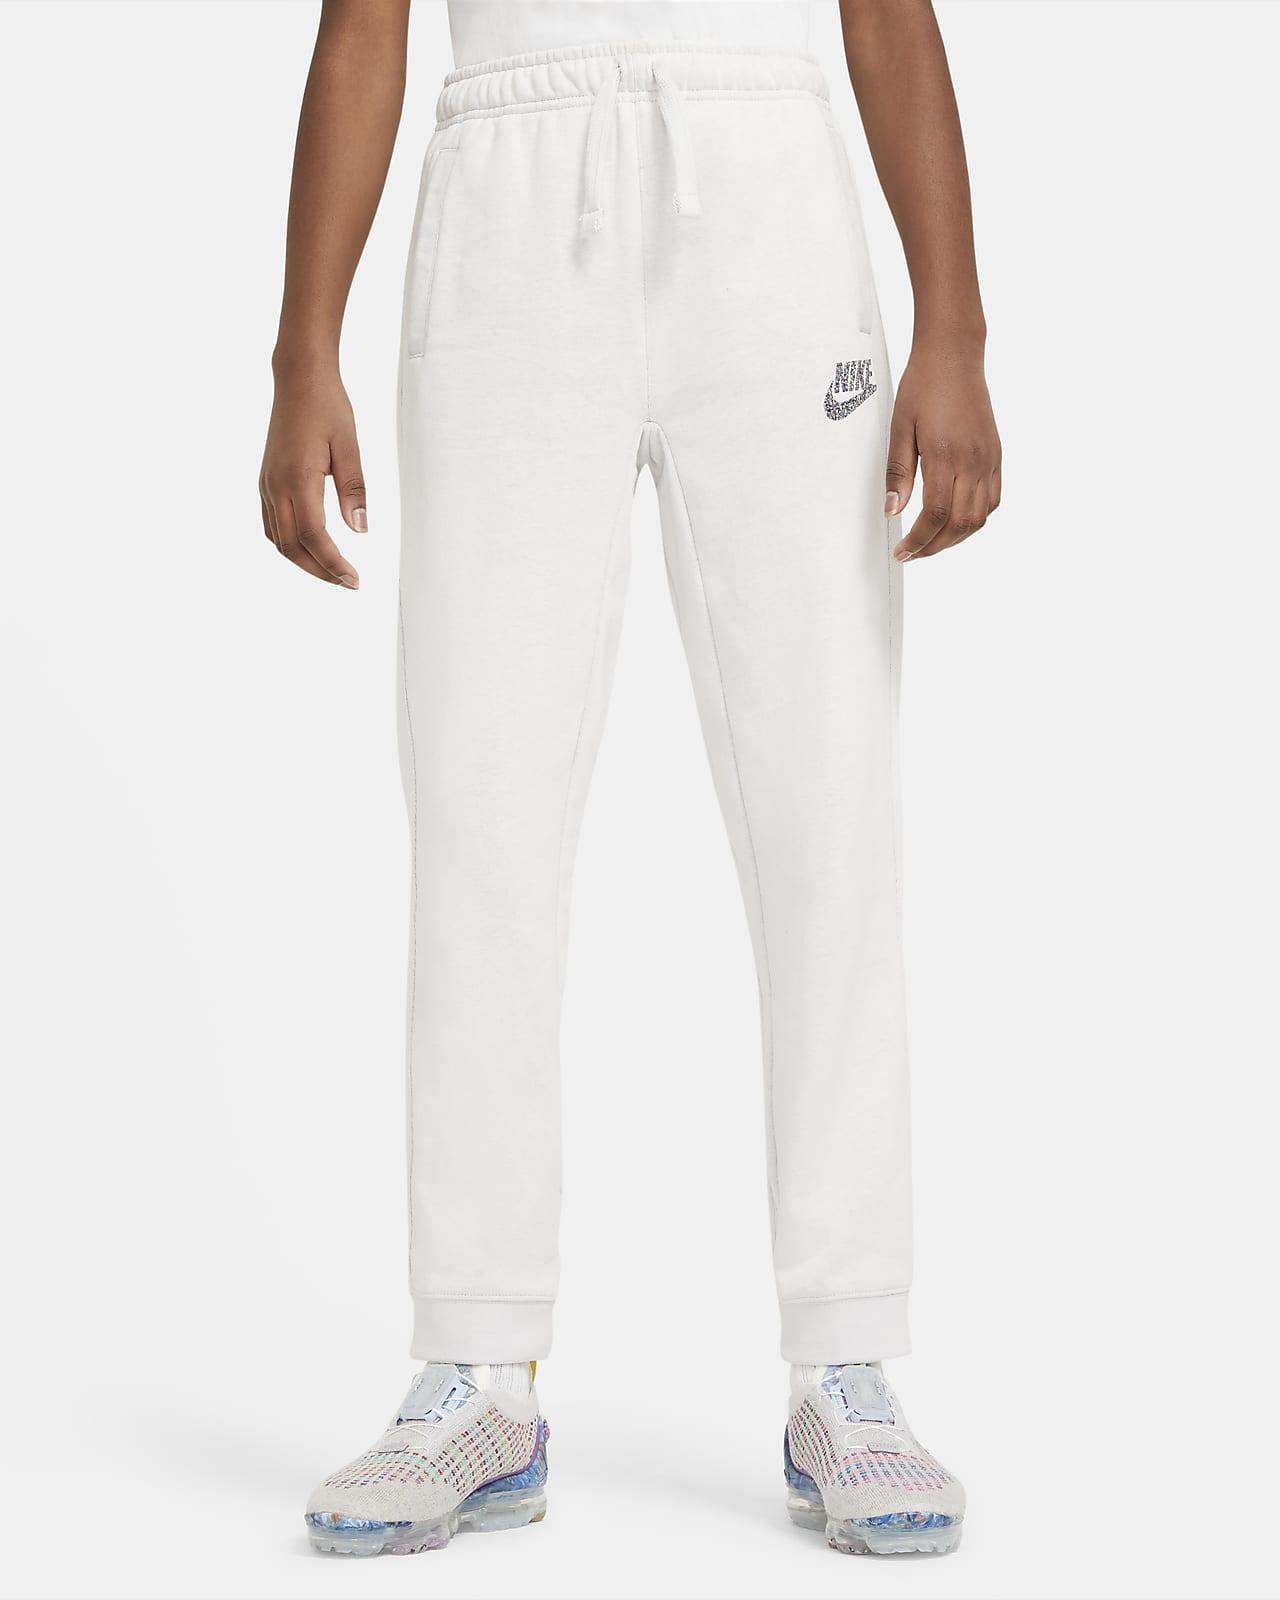 Pantalones para niños talla grande Nike Sportswear